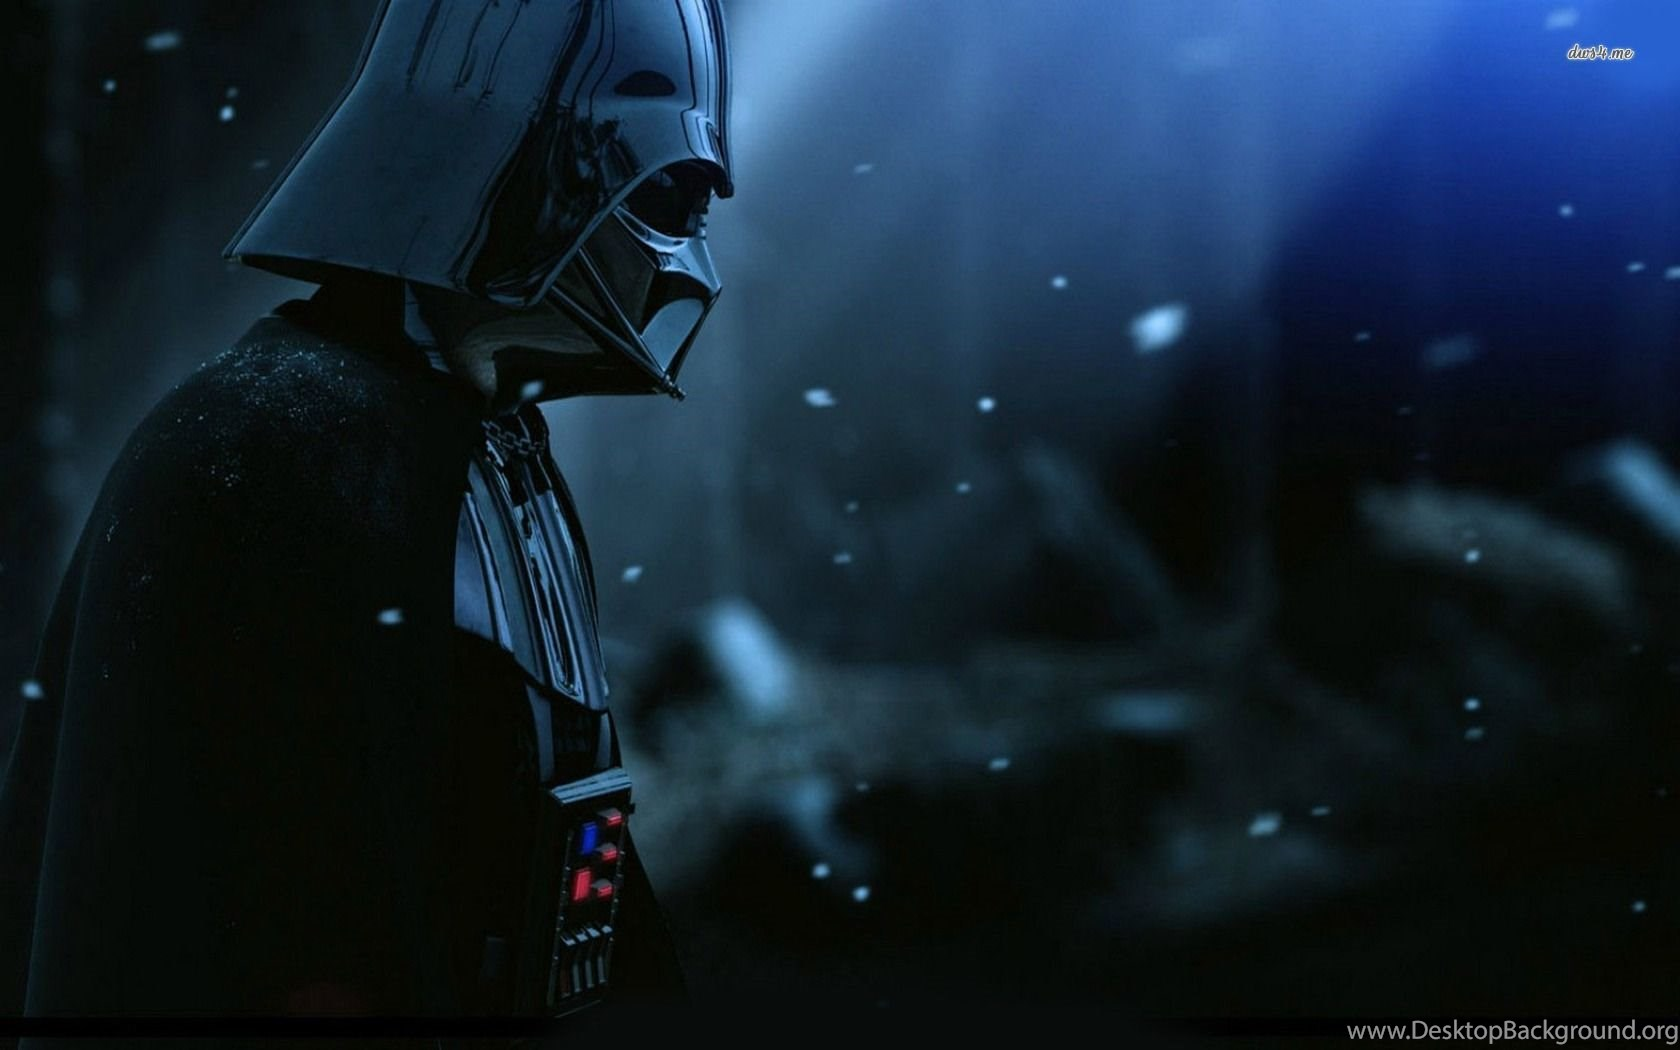 Darth Vader Wallpapers For Android Desktop Background